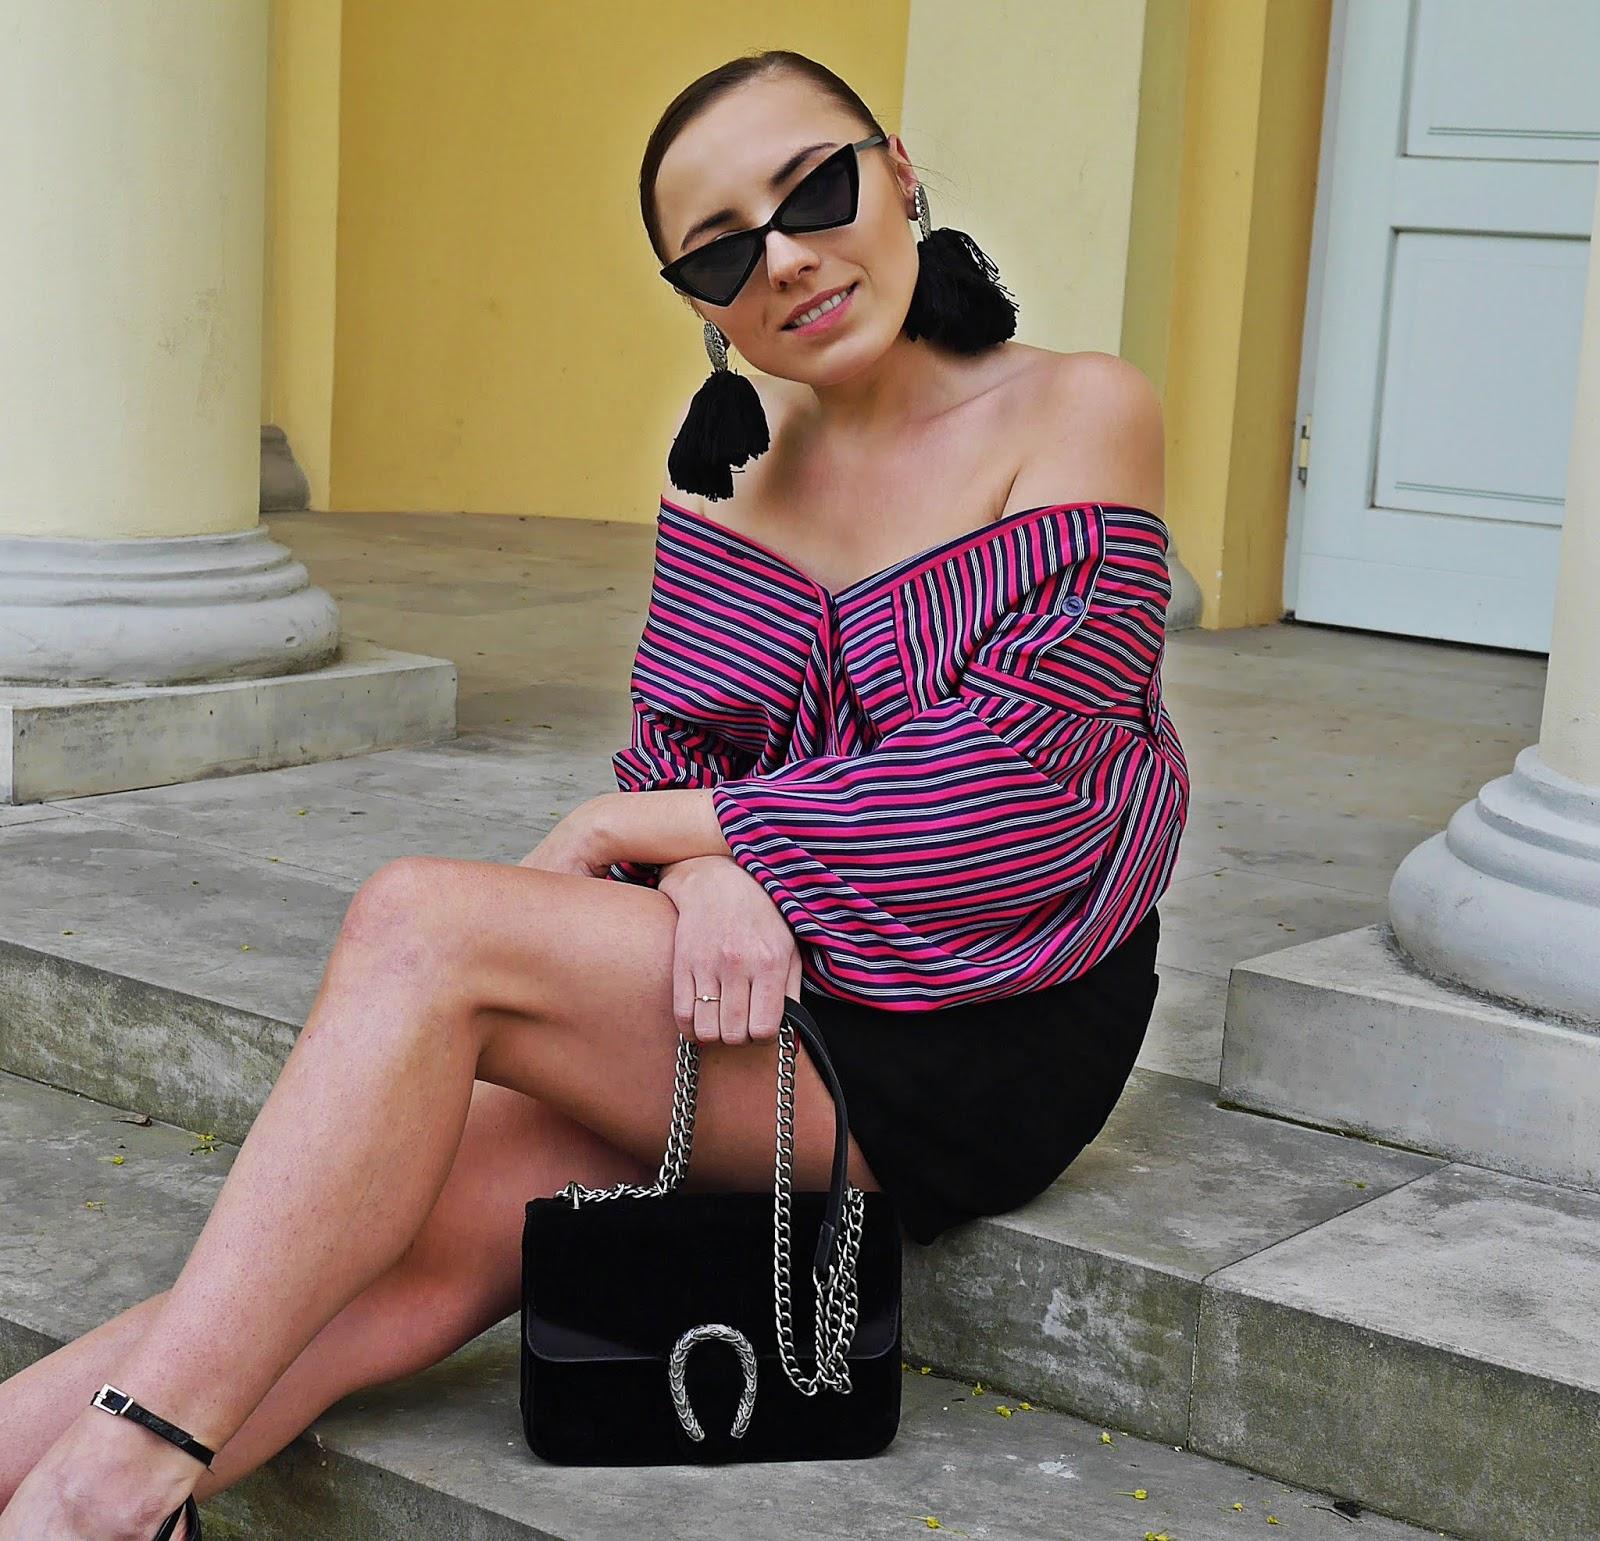 sandałki atmosphere asymetryczna spódnica trójkątne okulary torebka renee karyn blog modowy